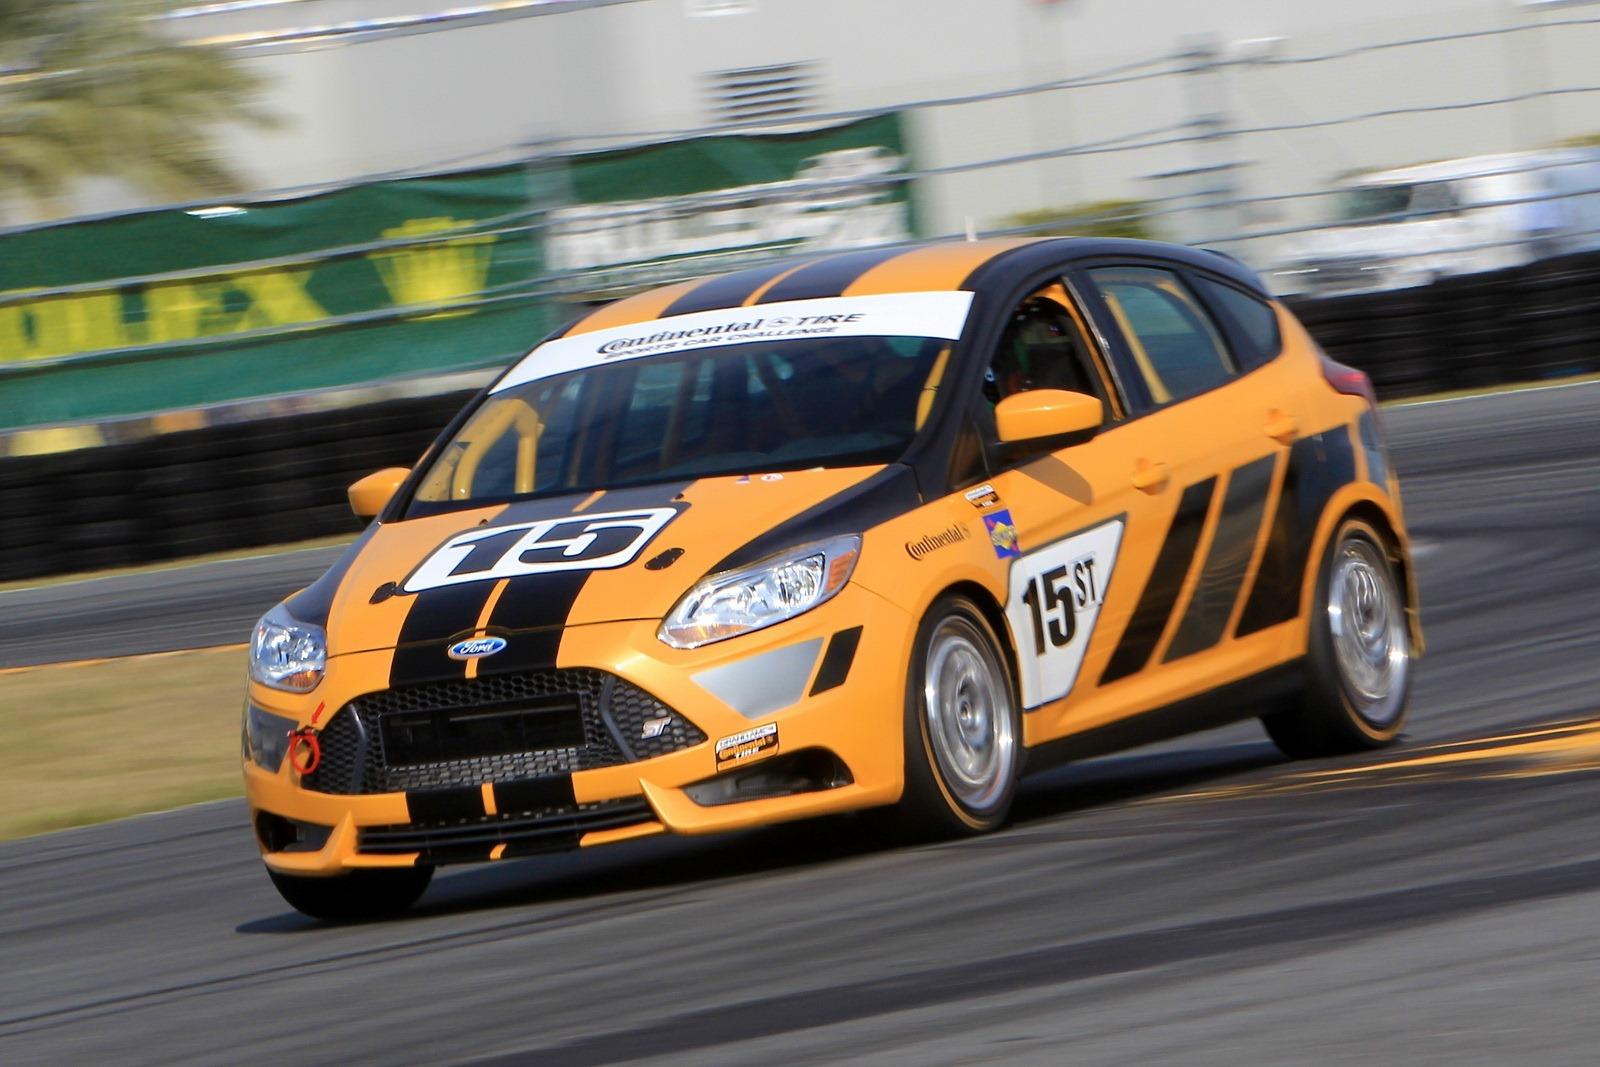 2013 Ford Focus St R Racing Debut At Daytona Grand Am 200